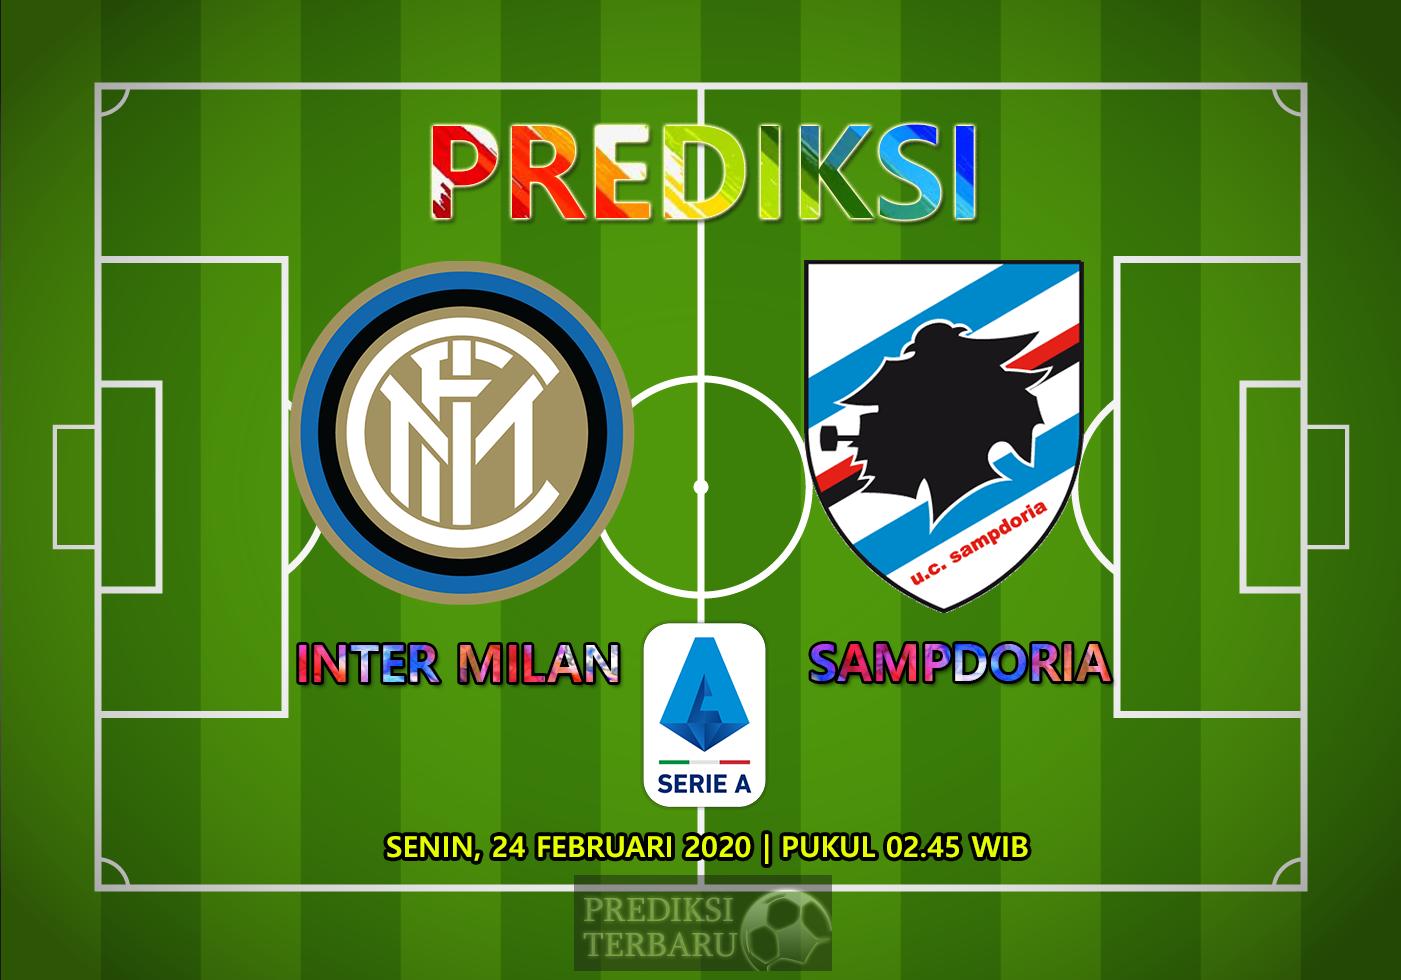 Prediksi Inter Milan Vs Sampdoria, Senin 24 Februari